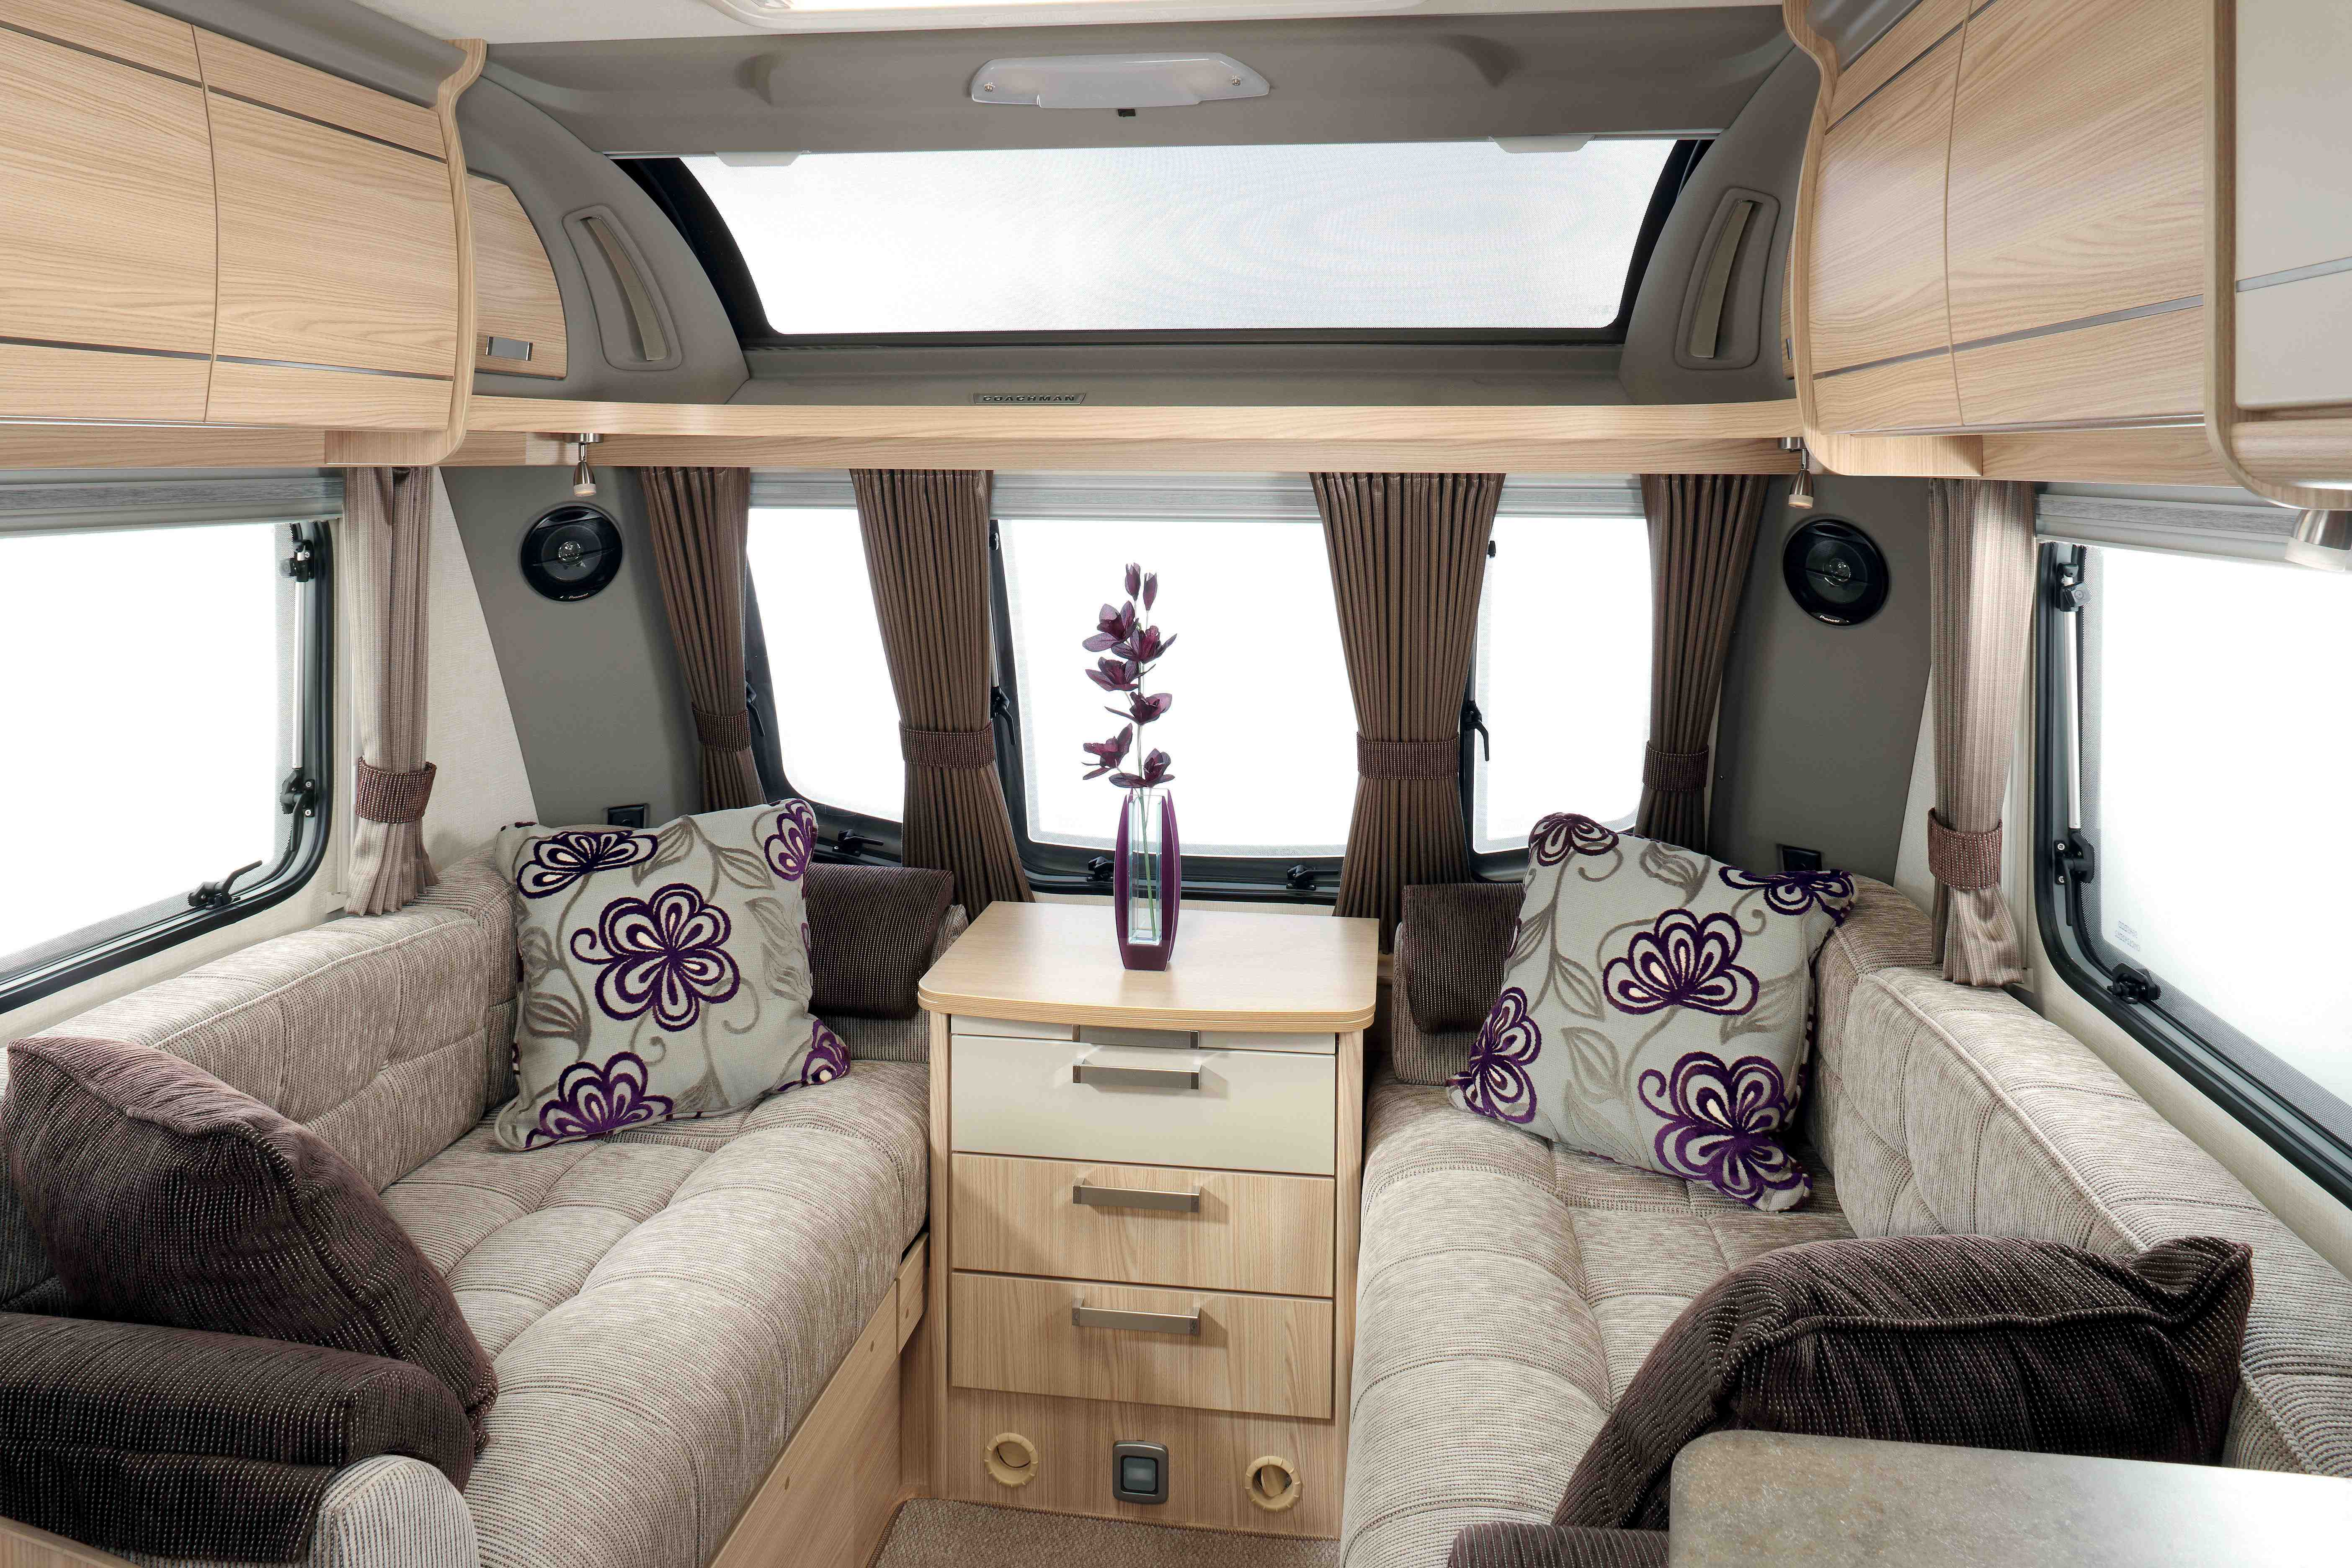 Coachman Pastiche seating area - Coachman Caravans